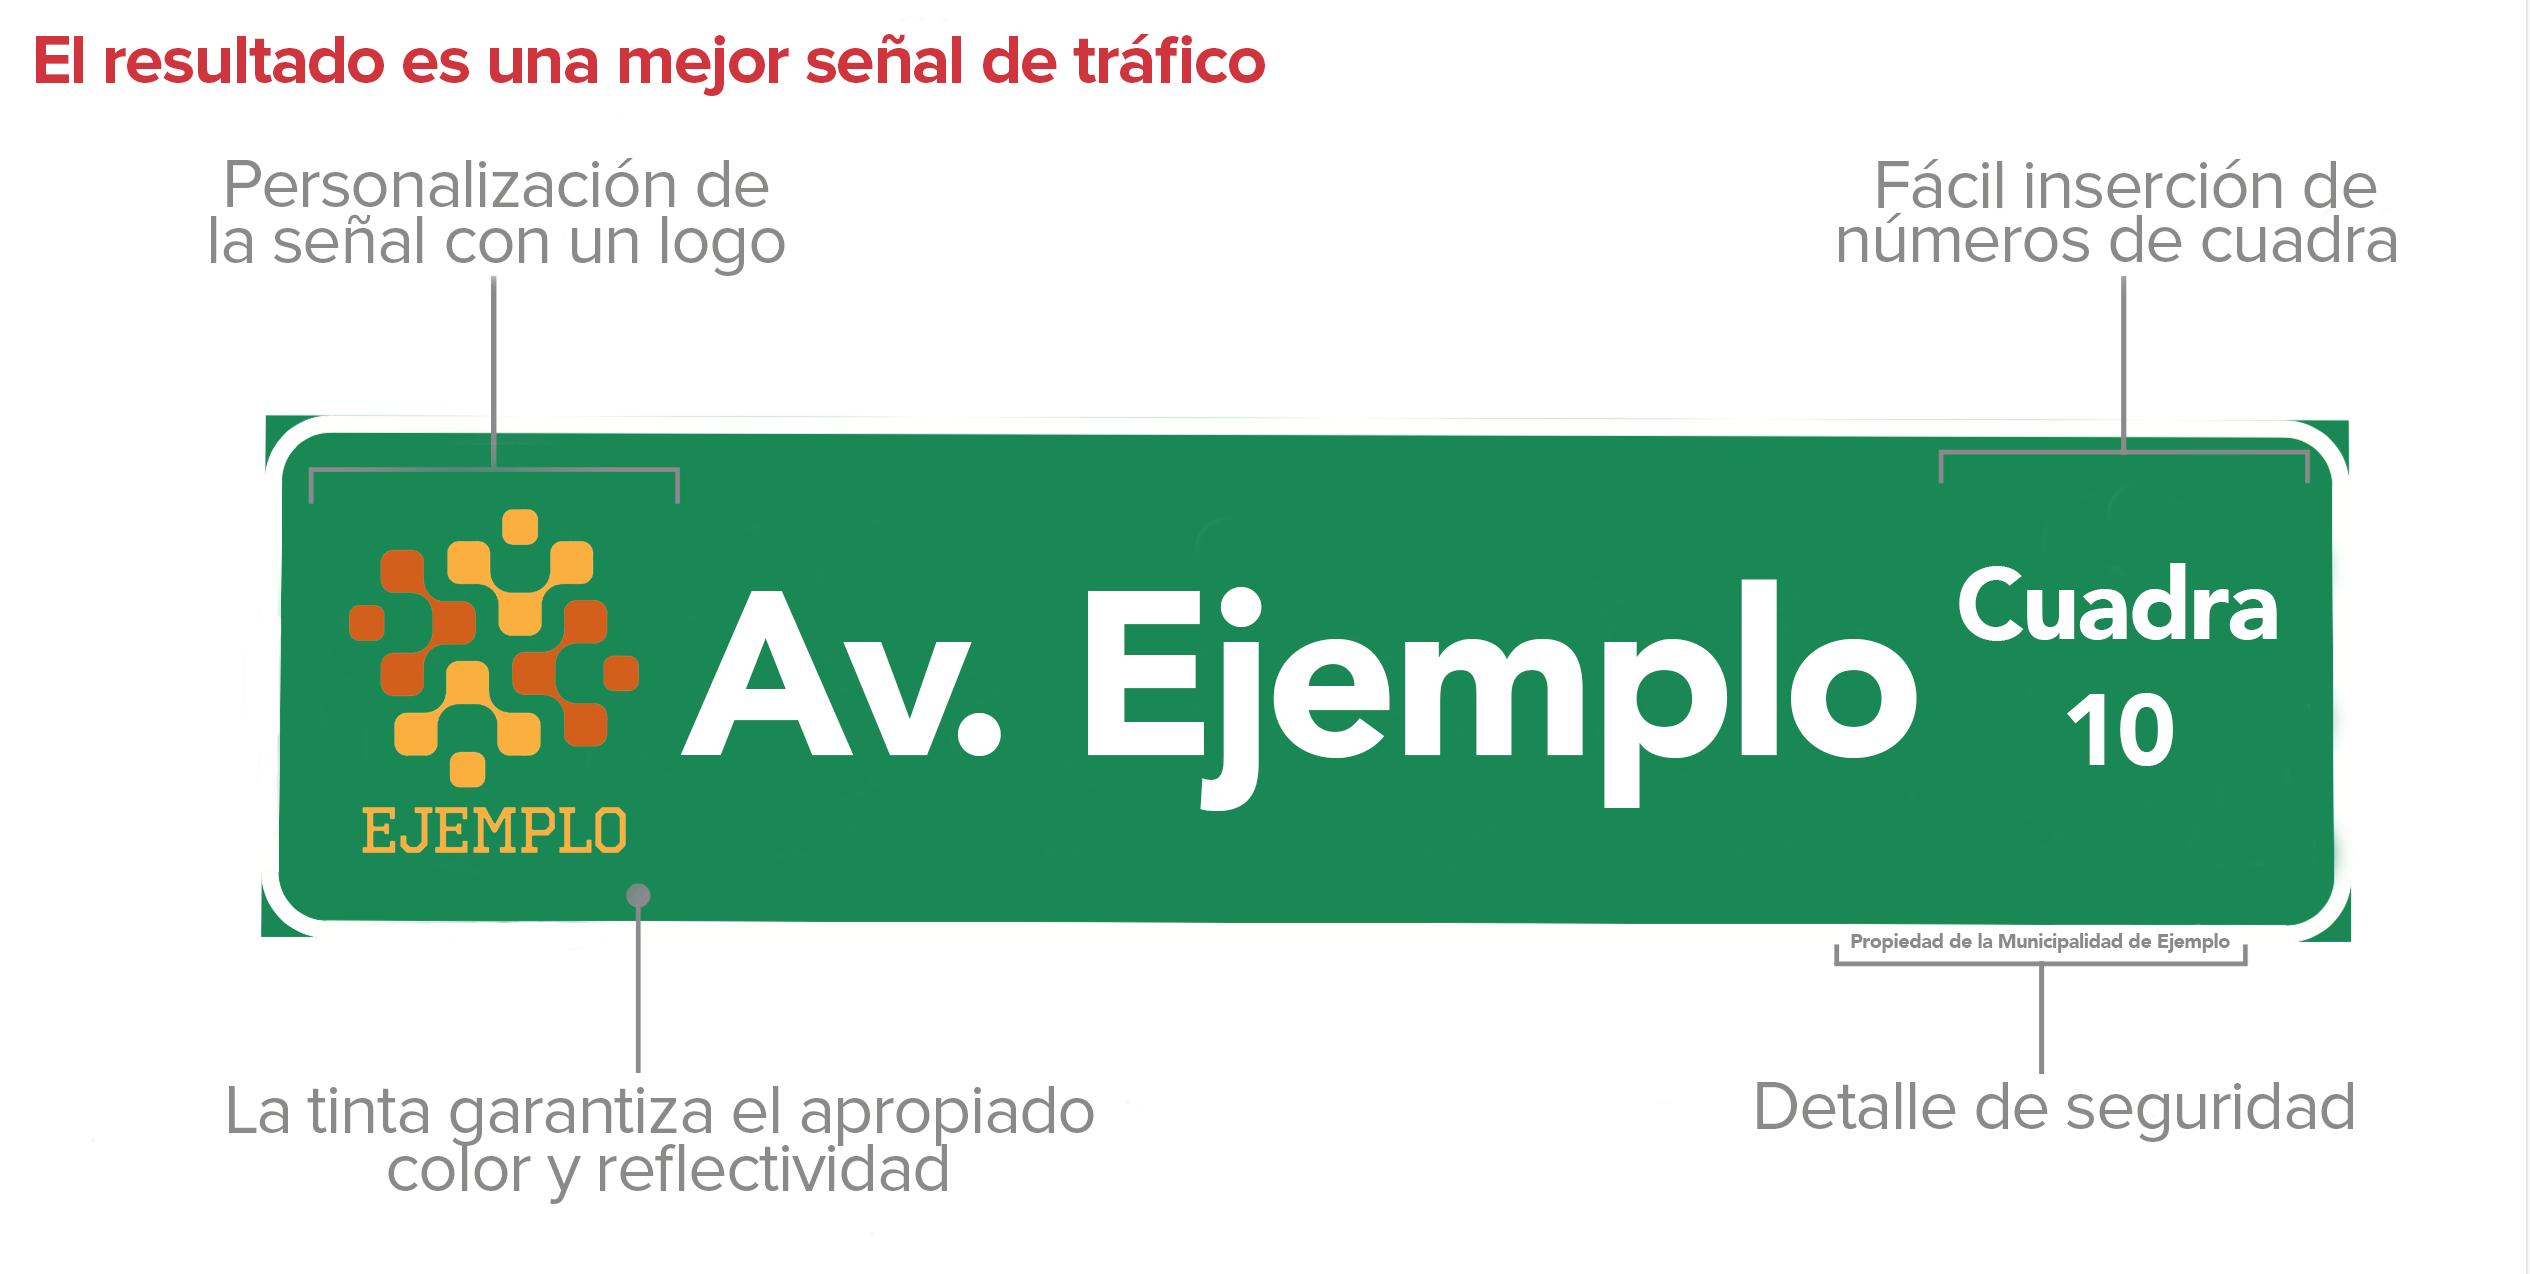 Impresora digital para señales de tráfico TrafficJet 4